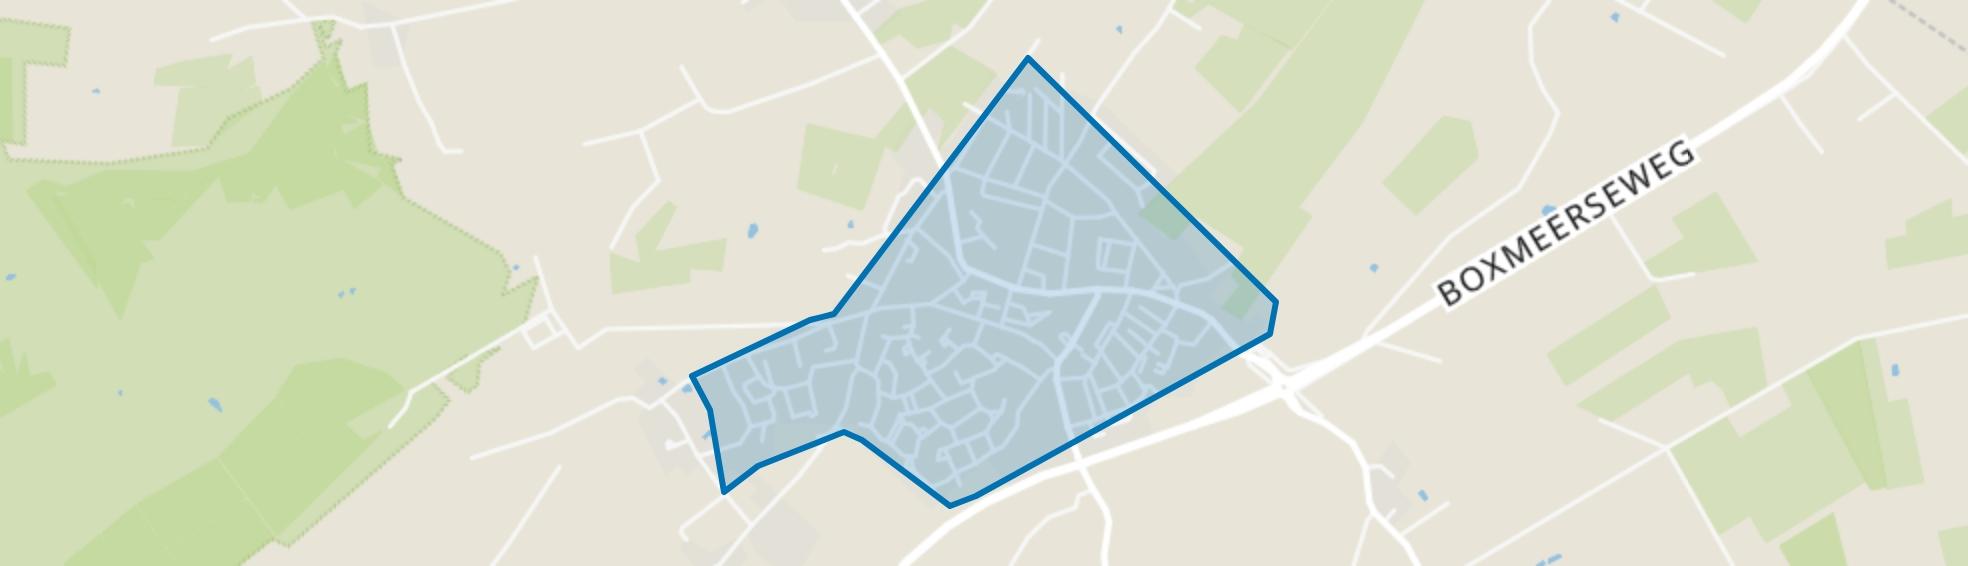 Sint Anthonis, Sint Anthonis map